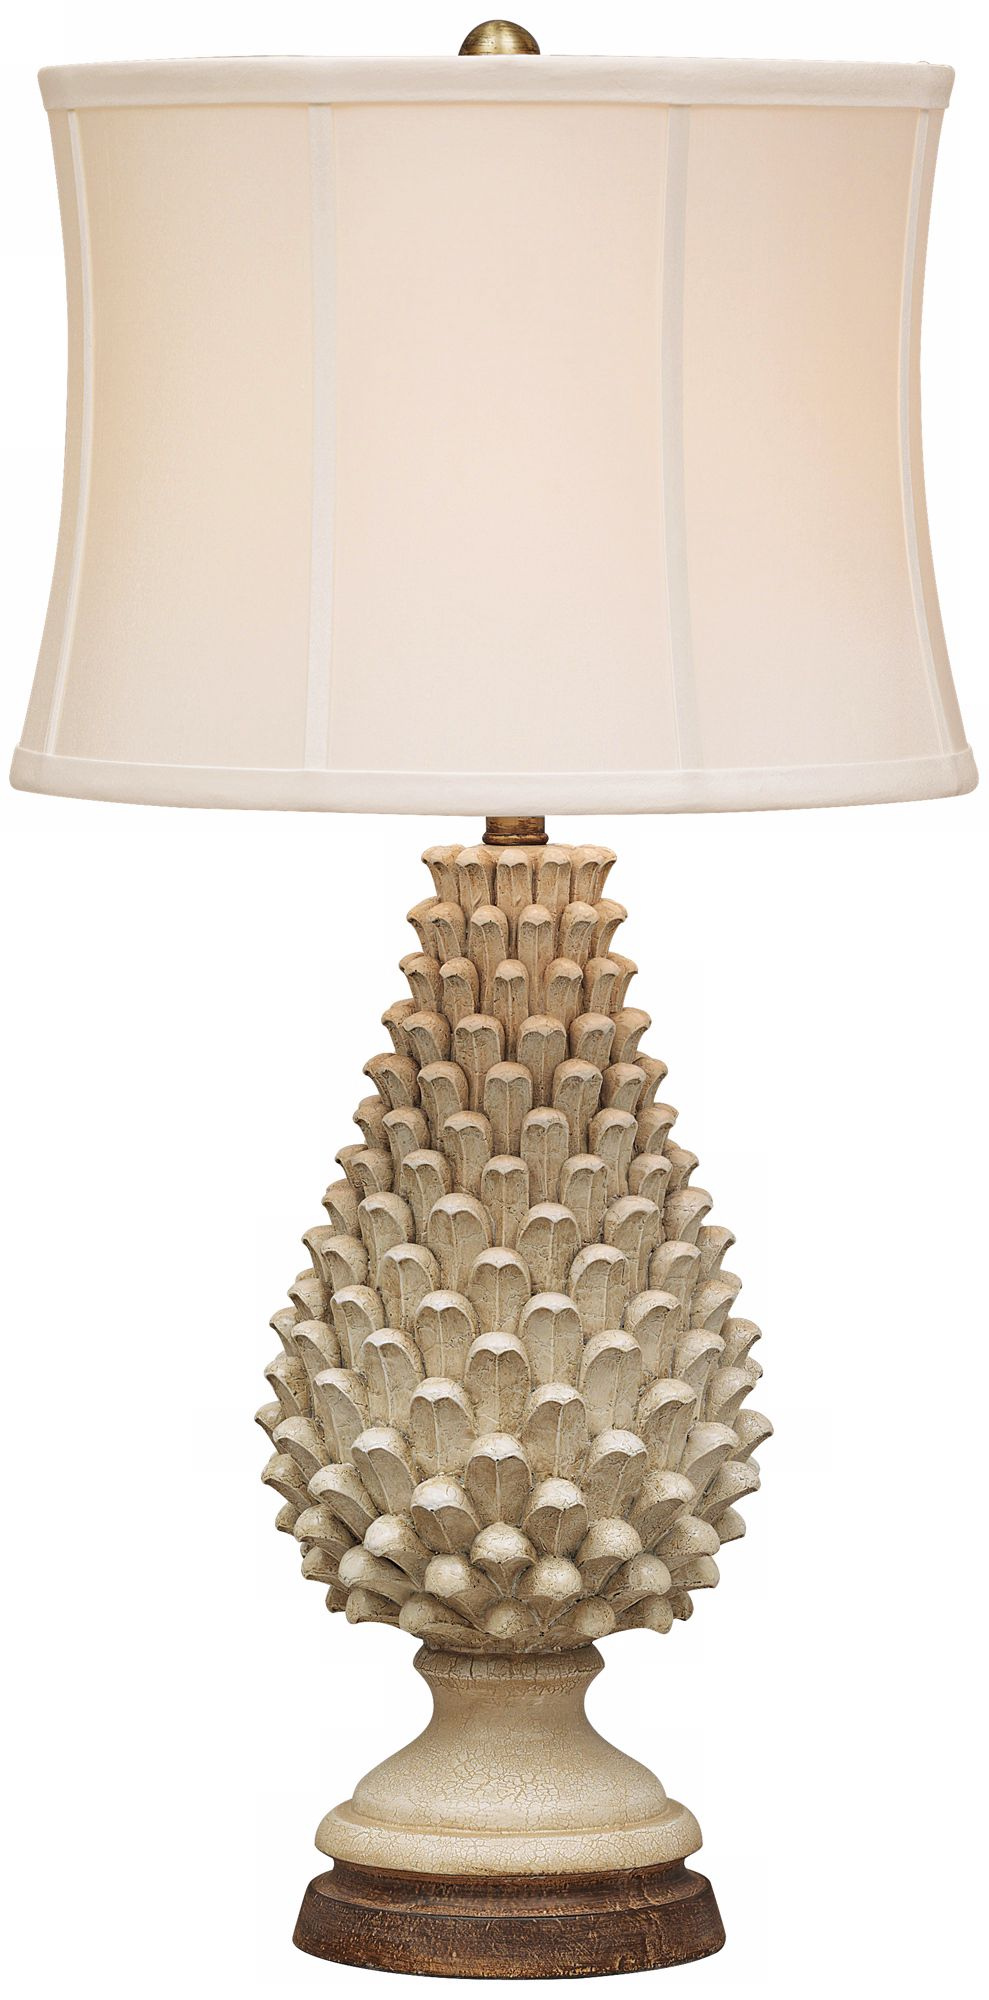 Beautiful Artichoke Crackle Tuscan Table Lamp